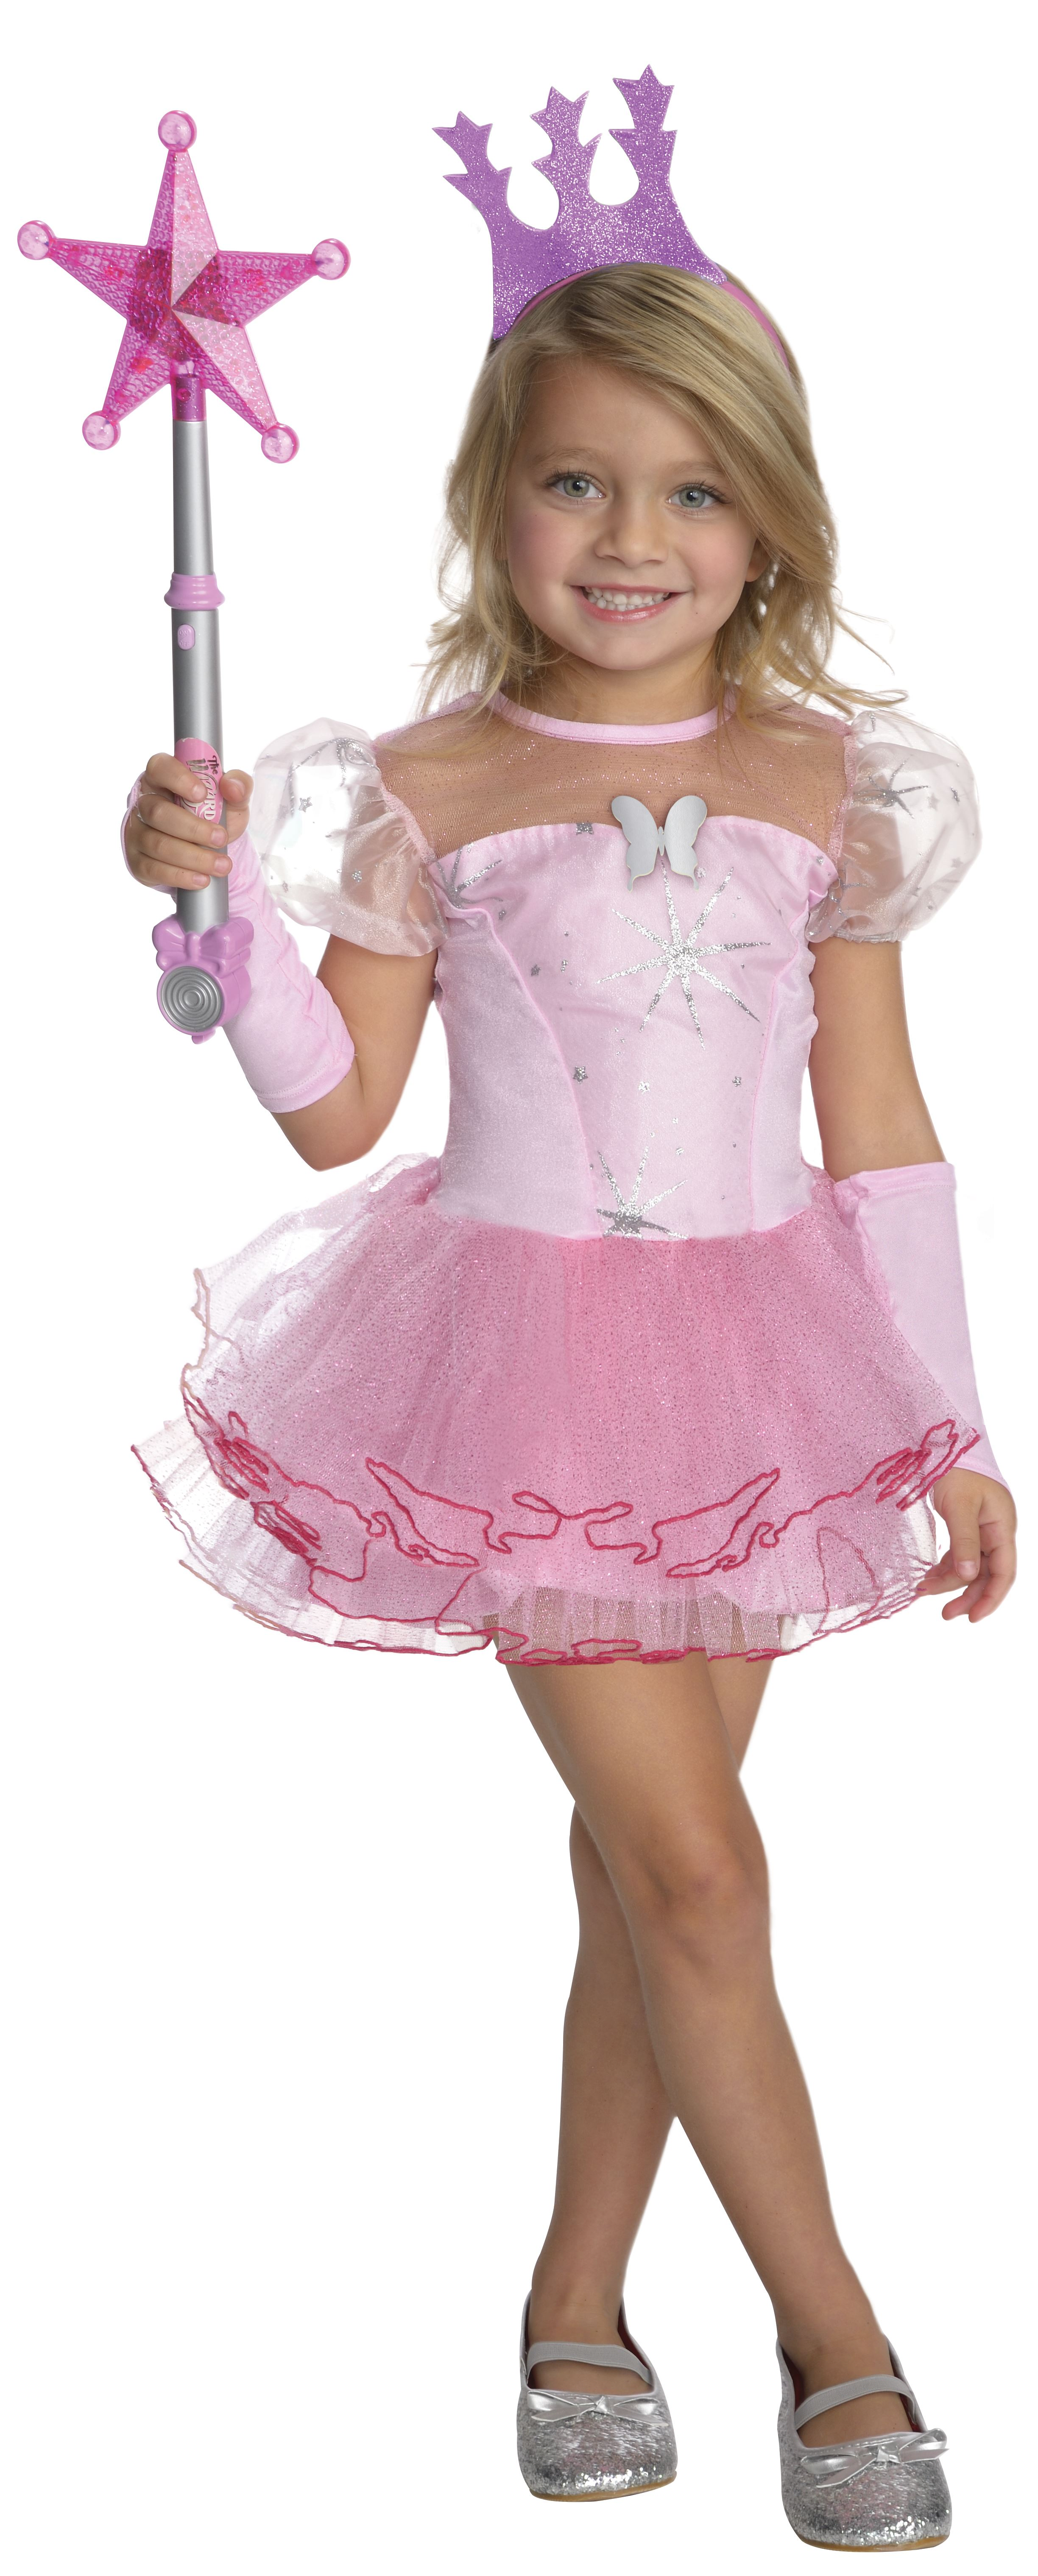 Express Adult costume glinda halloween opinion